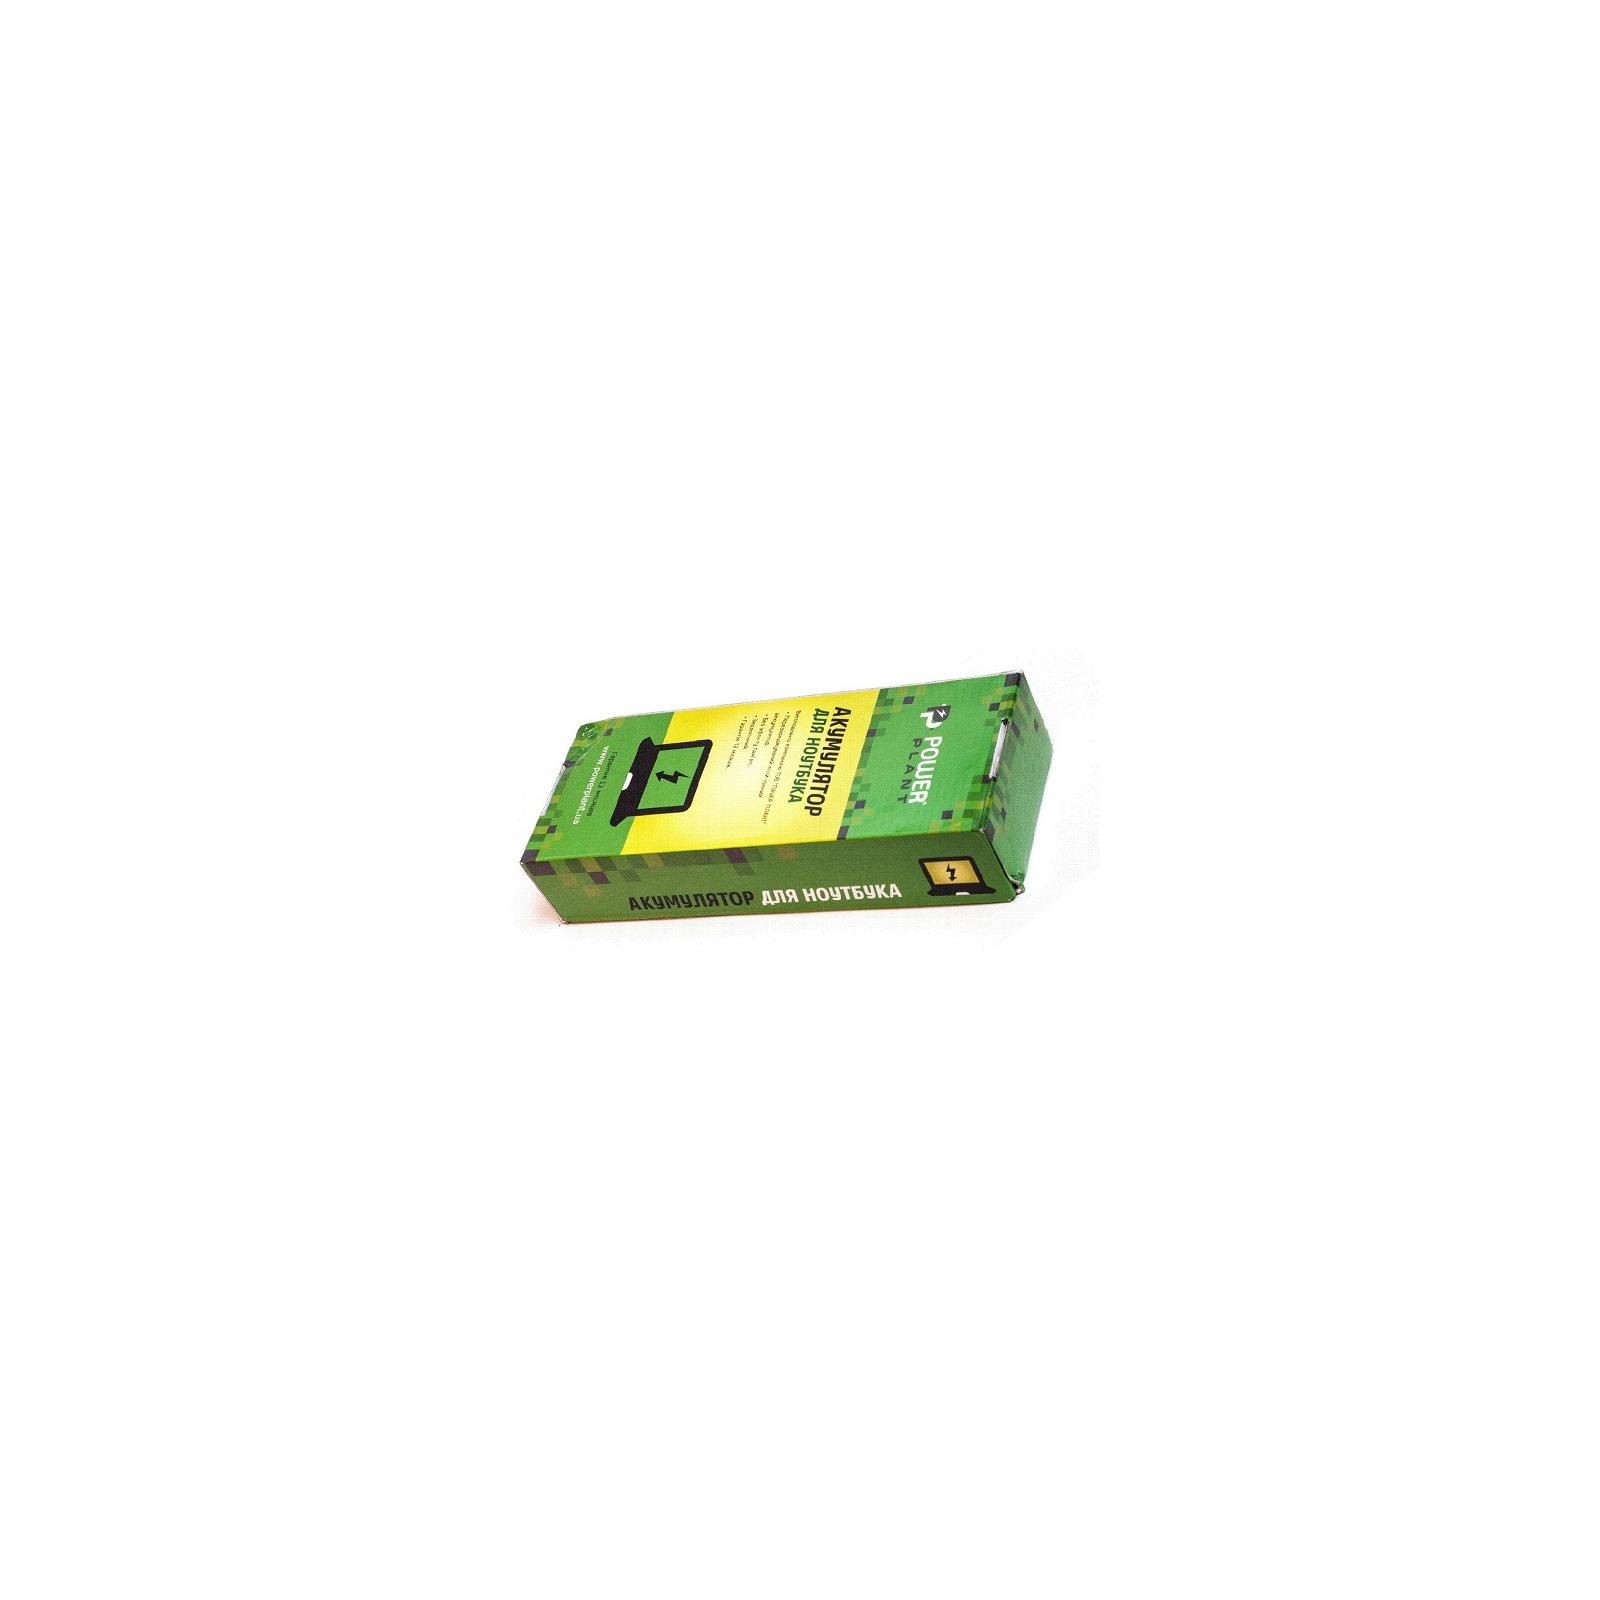 Аккумулятор для ноутбука FUJITSU Amilo V3205 (SQU-522, FU5180LH) 11.1V 5200mAh PowerPlant (NB00000119) изображение 3